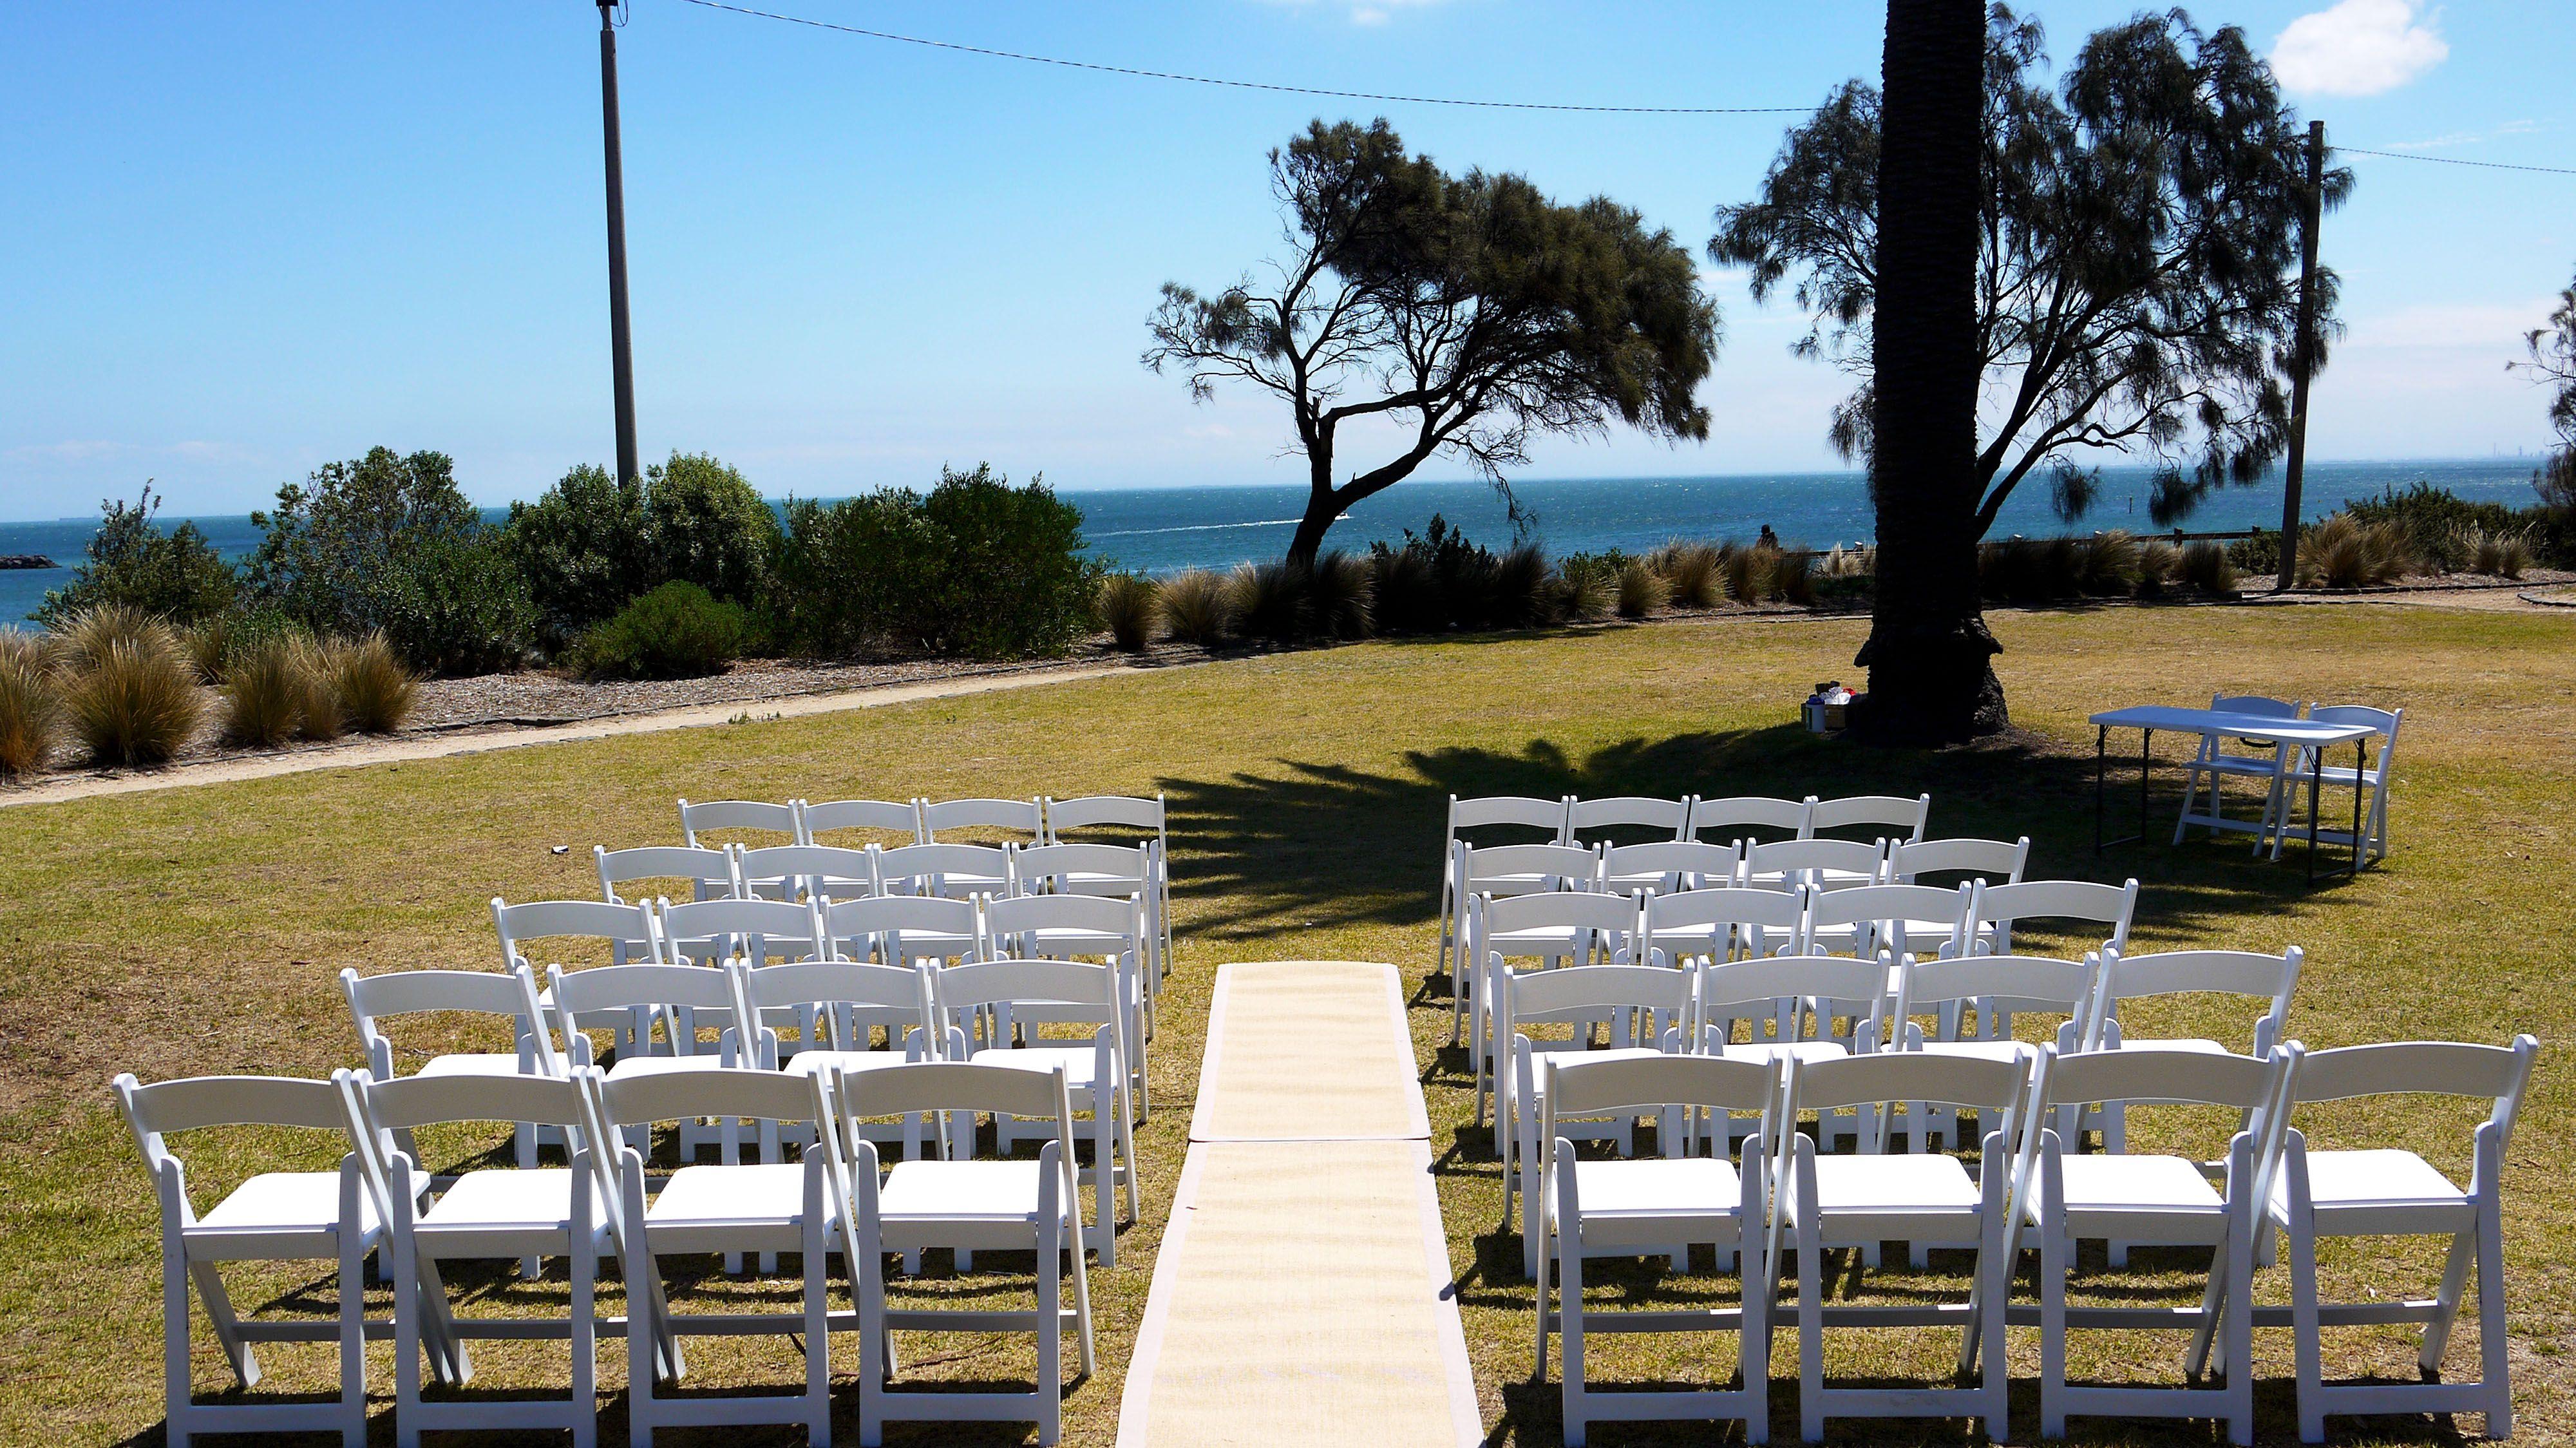 Wedding Chair Cover Hire Brighton Lowes Wicker Chairs B J Ferdinando Gardens Hampton Beach Foreshore